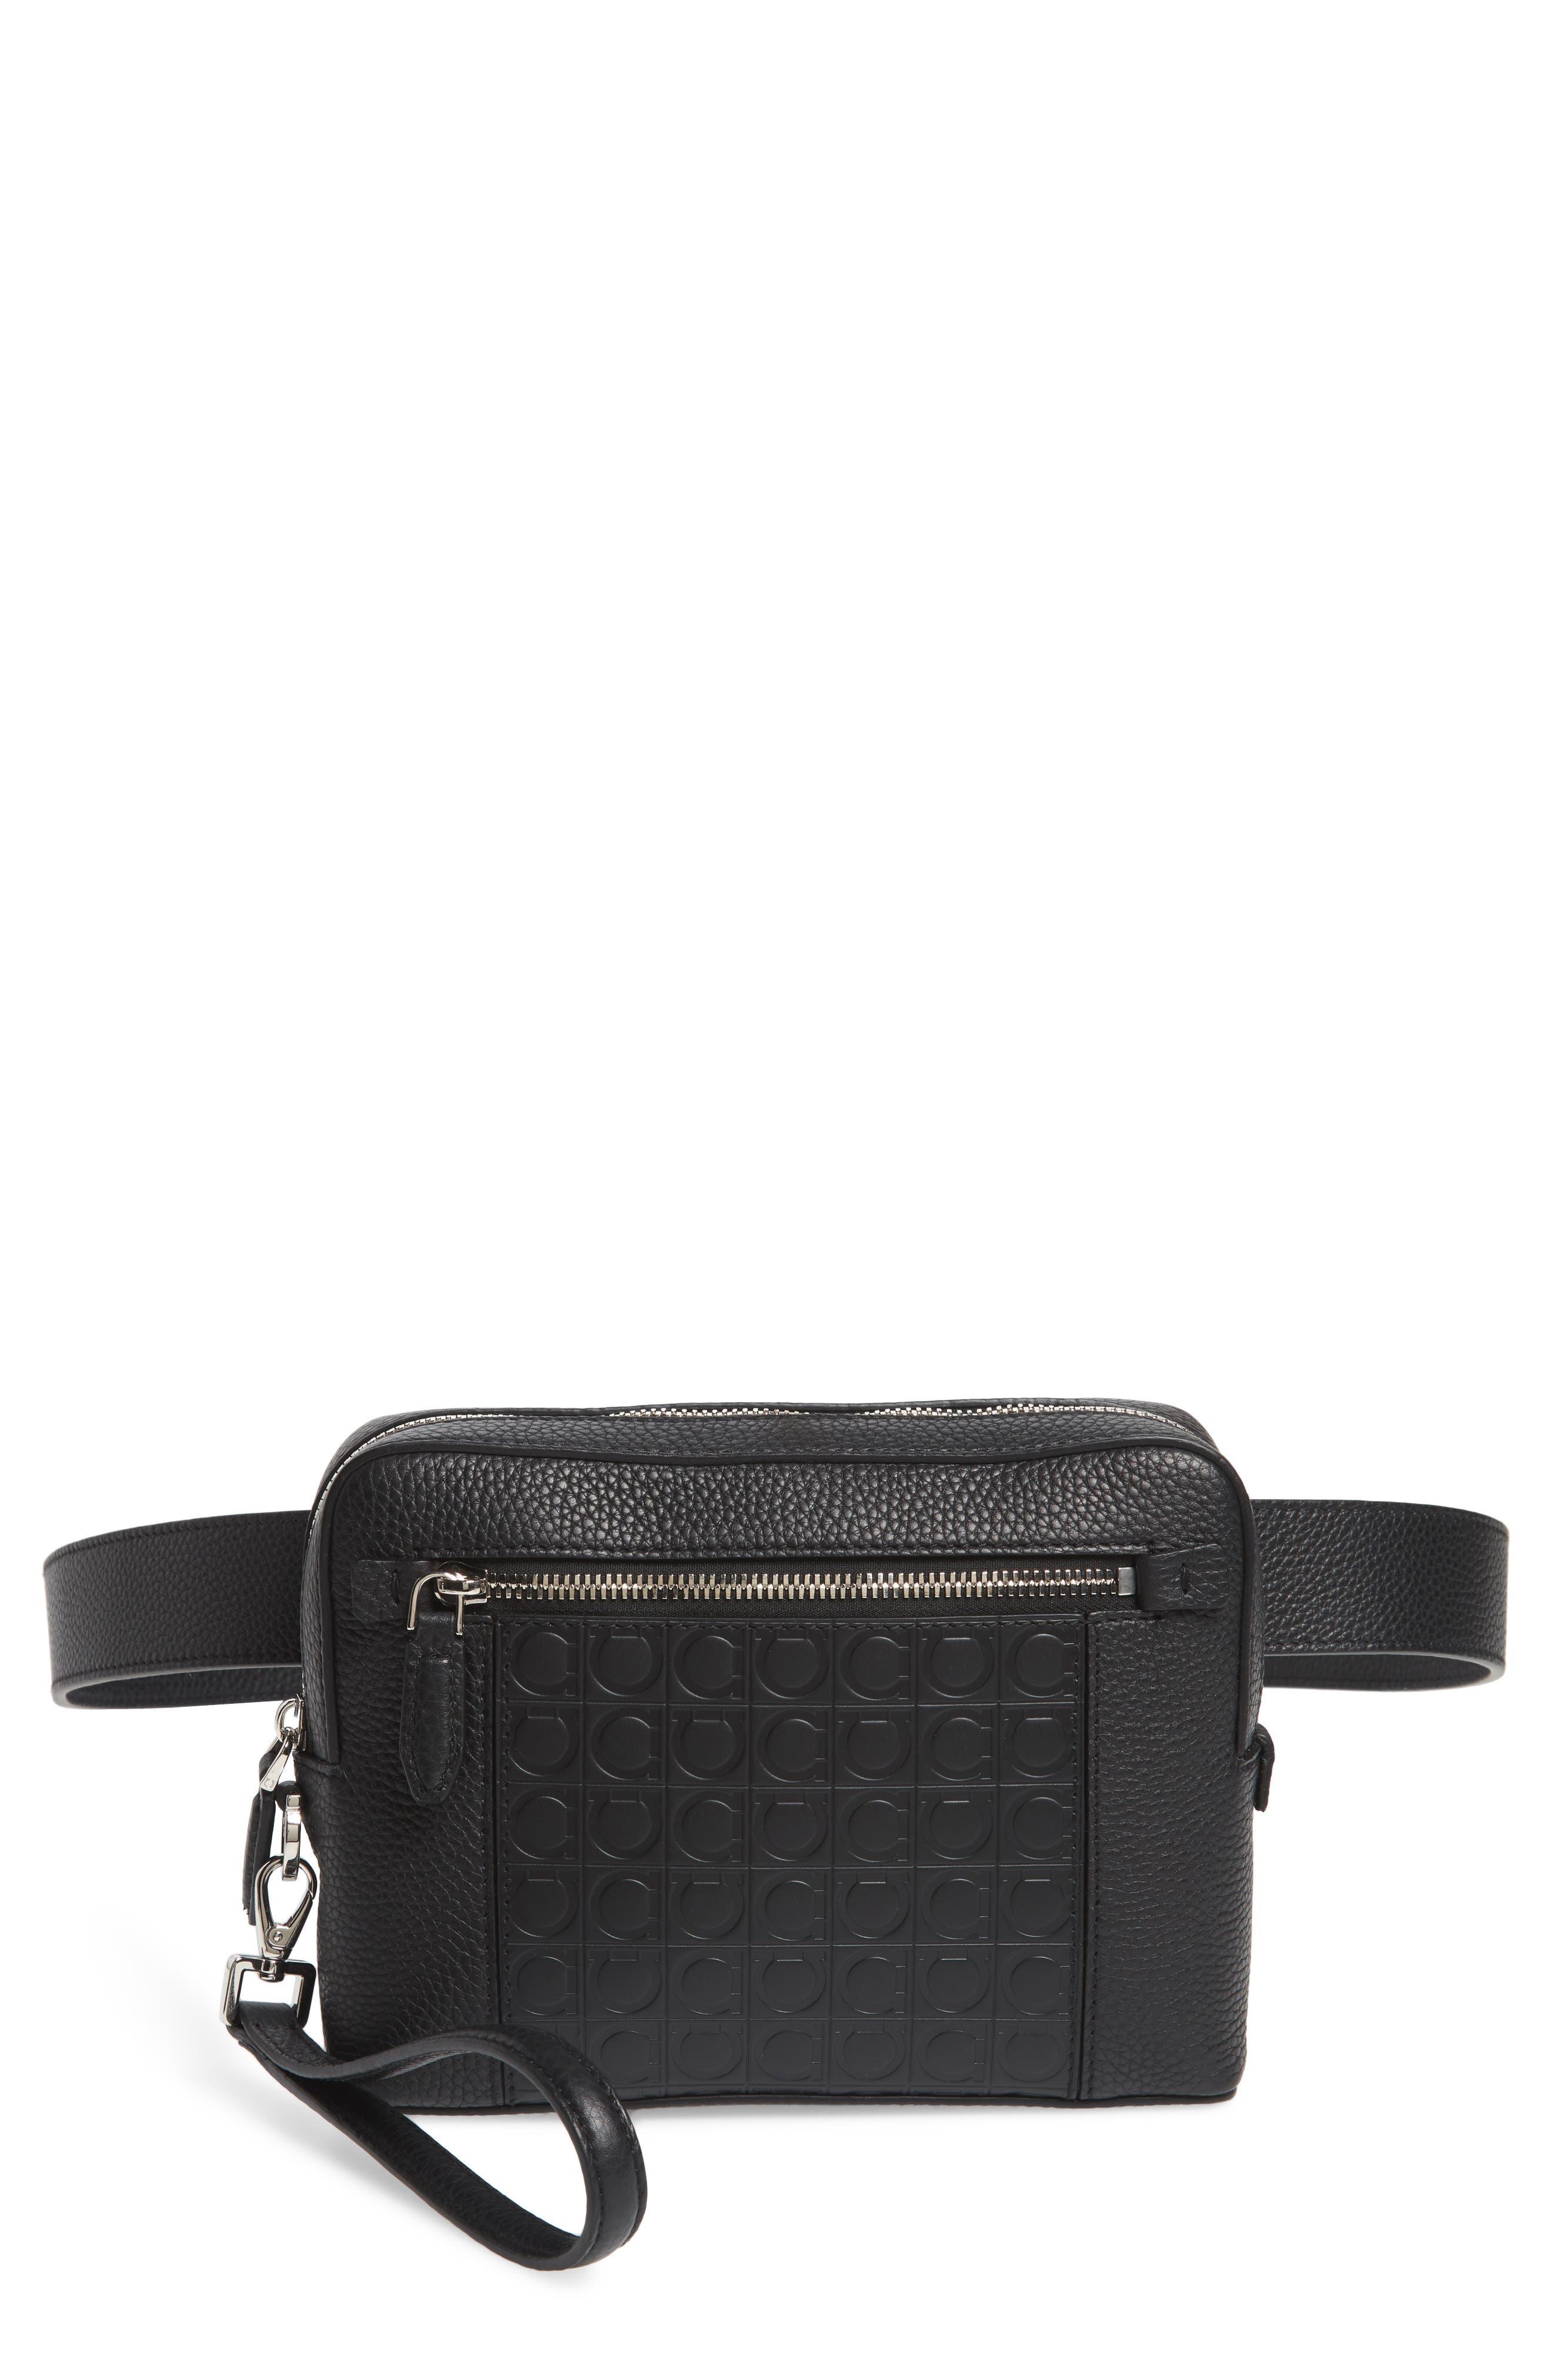 f594d82f8348 Salvatore Ferragamo Textured Leather Belt Bag - Black In Nero  Nero ...